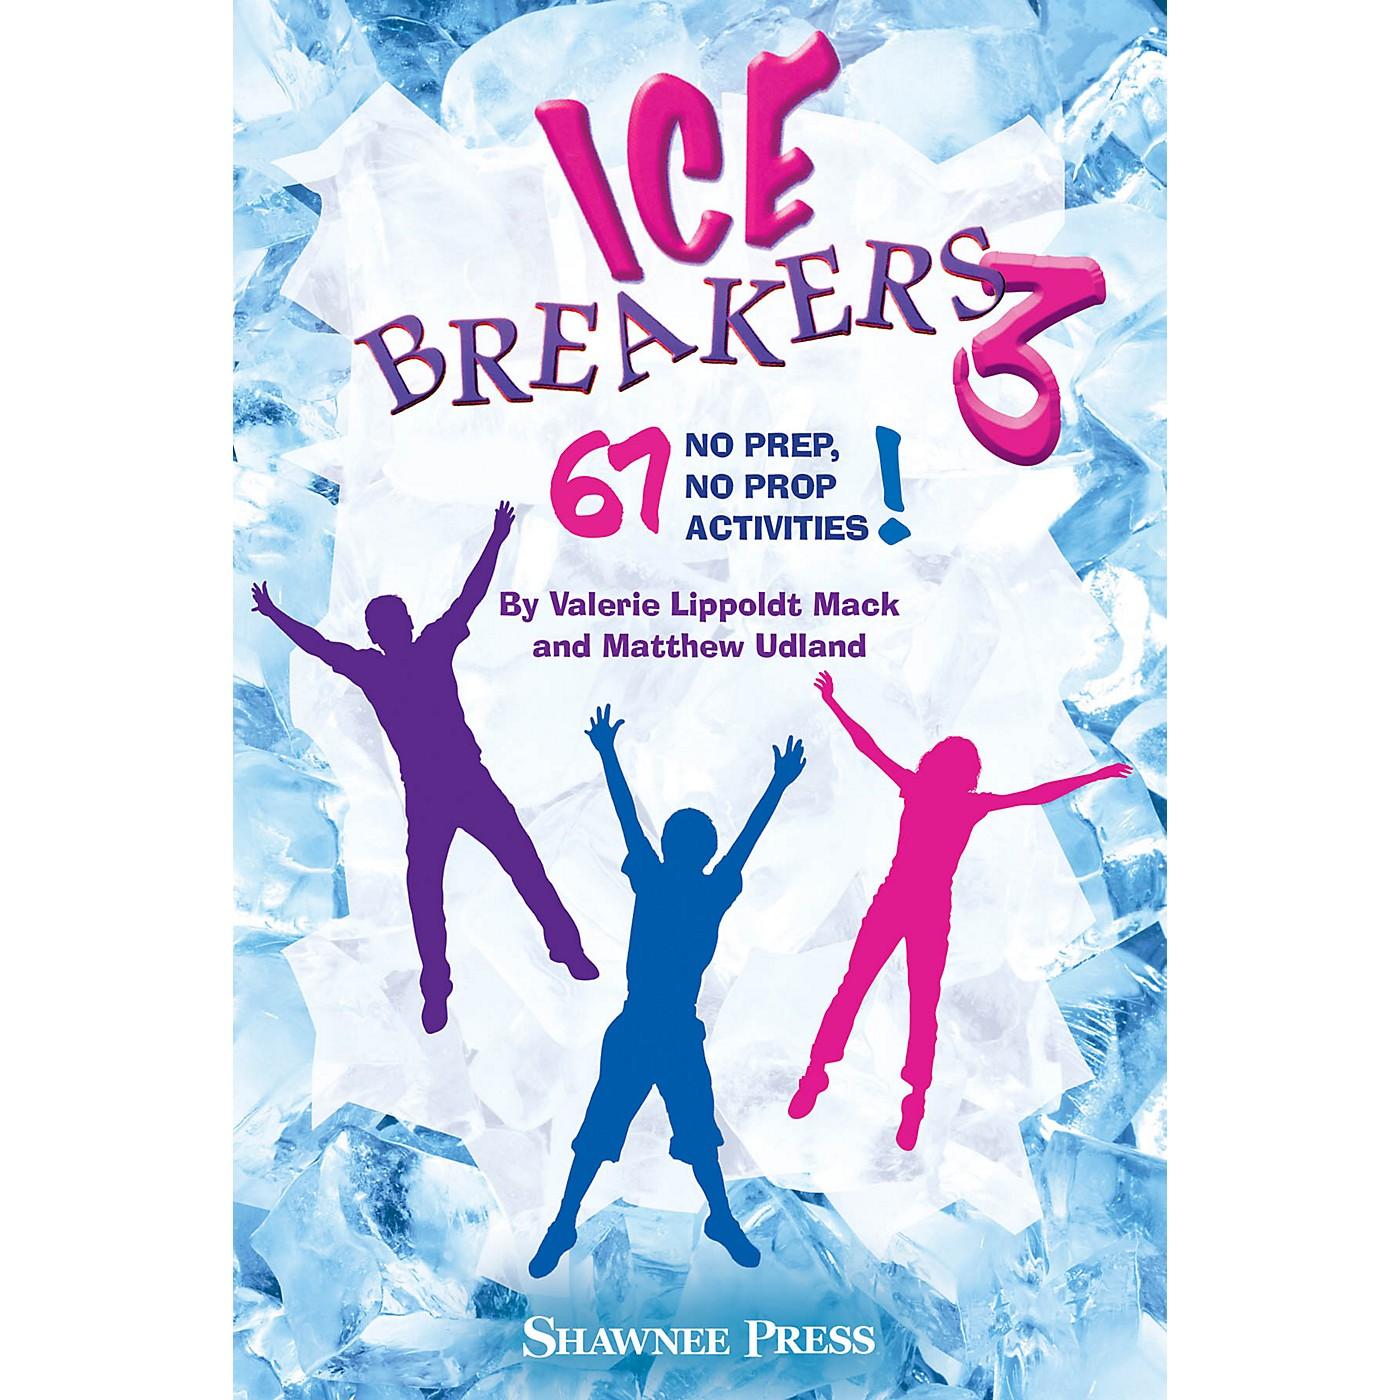 Hal Leonard IceBreakers 3 (67 No Prep, No Prop Activities!) music activities & puzzles by Valerie Lippoldt Mack thumbnail